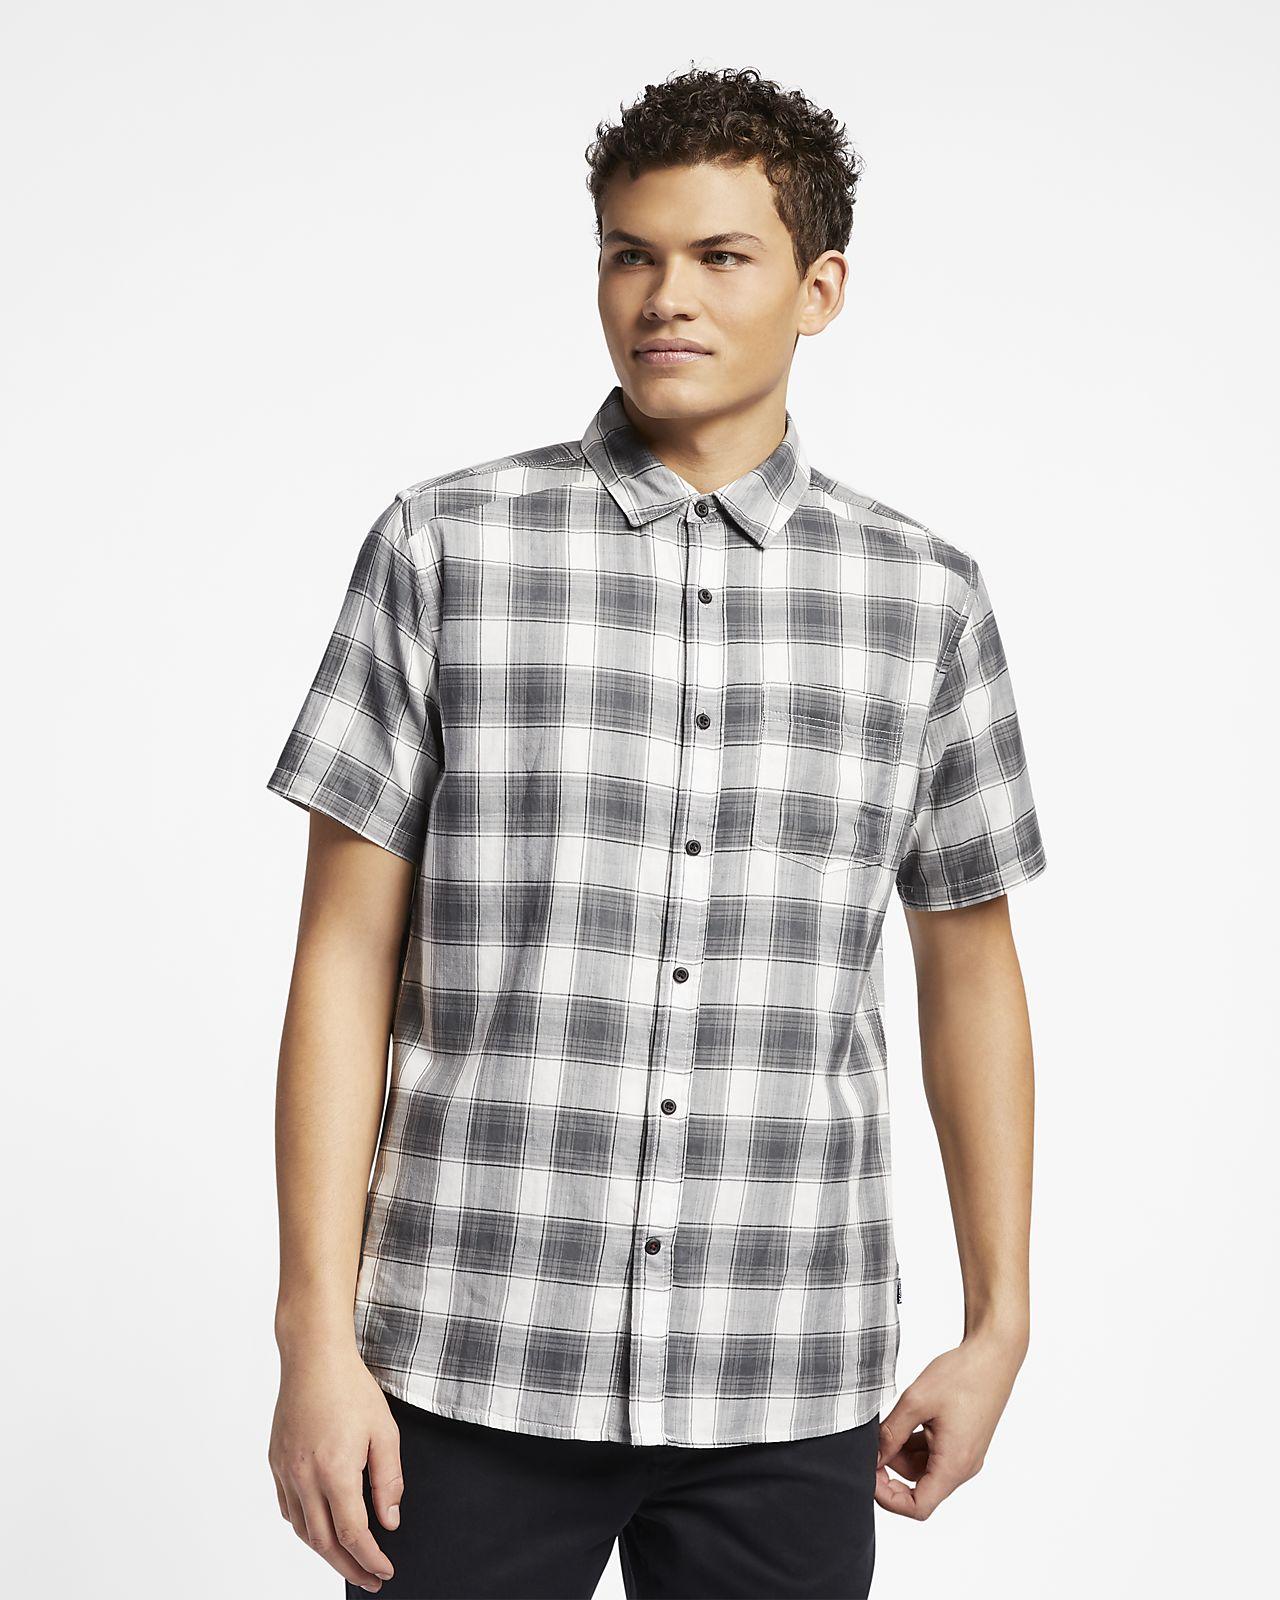 Hurley Pack Archie Men's Short-Sleeve Shirt